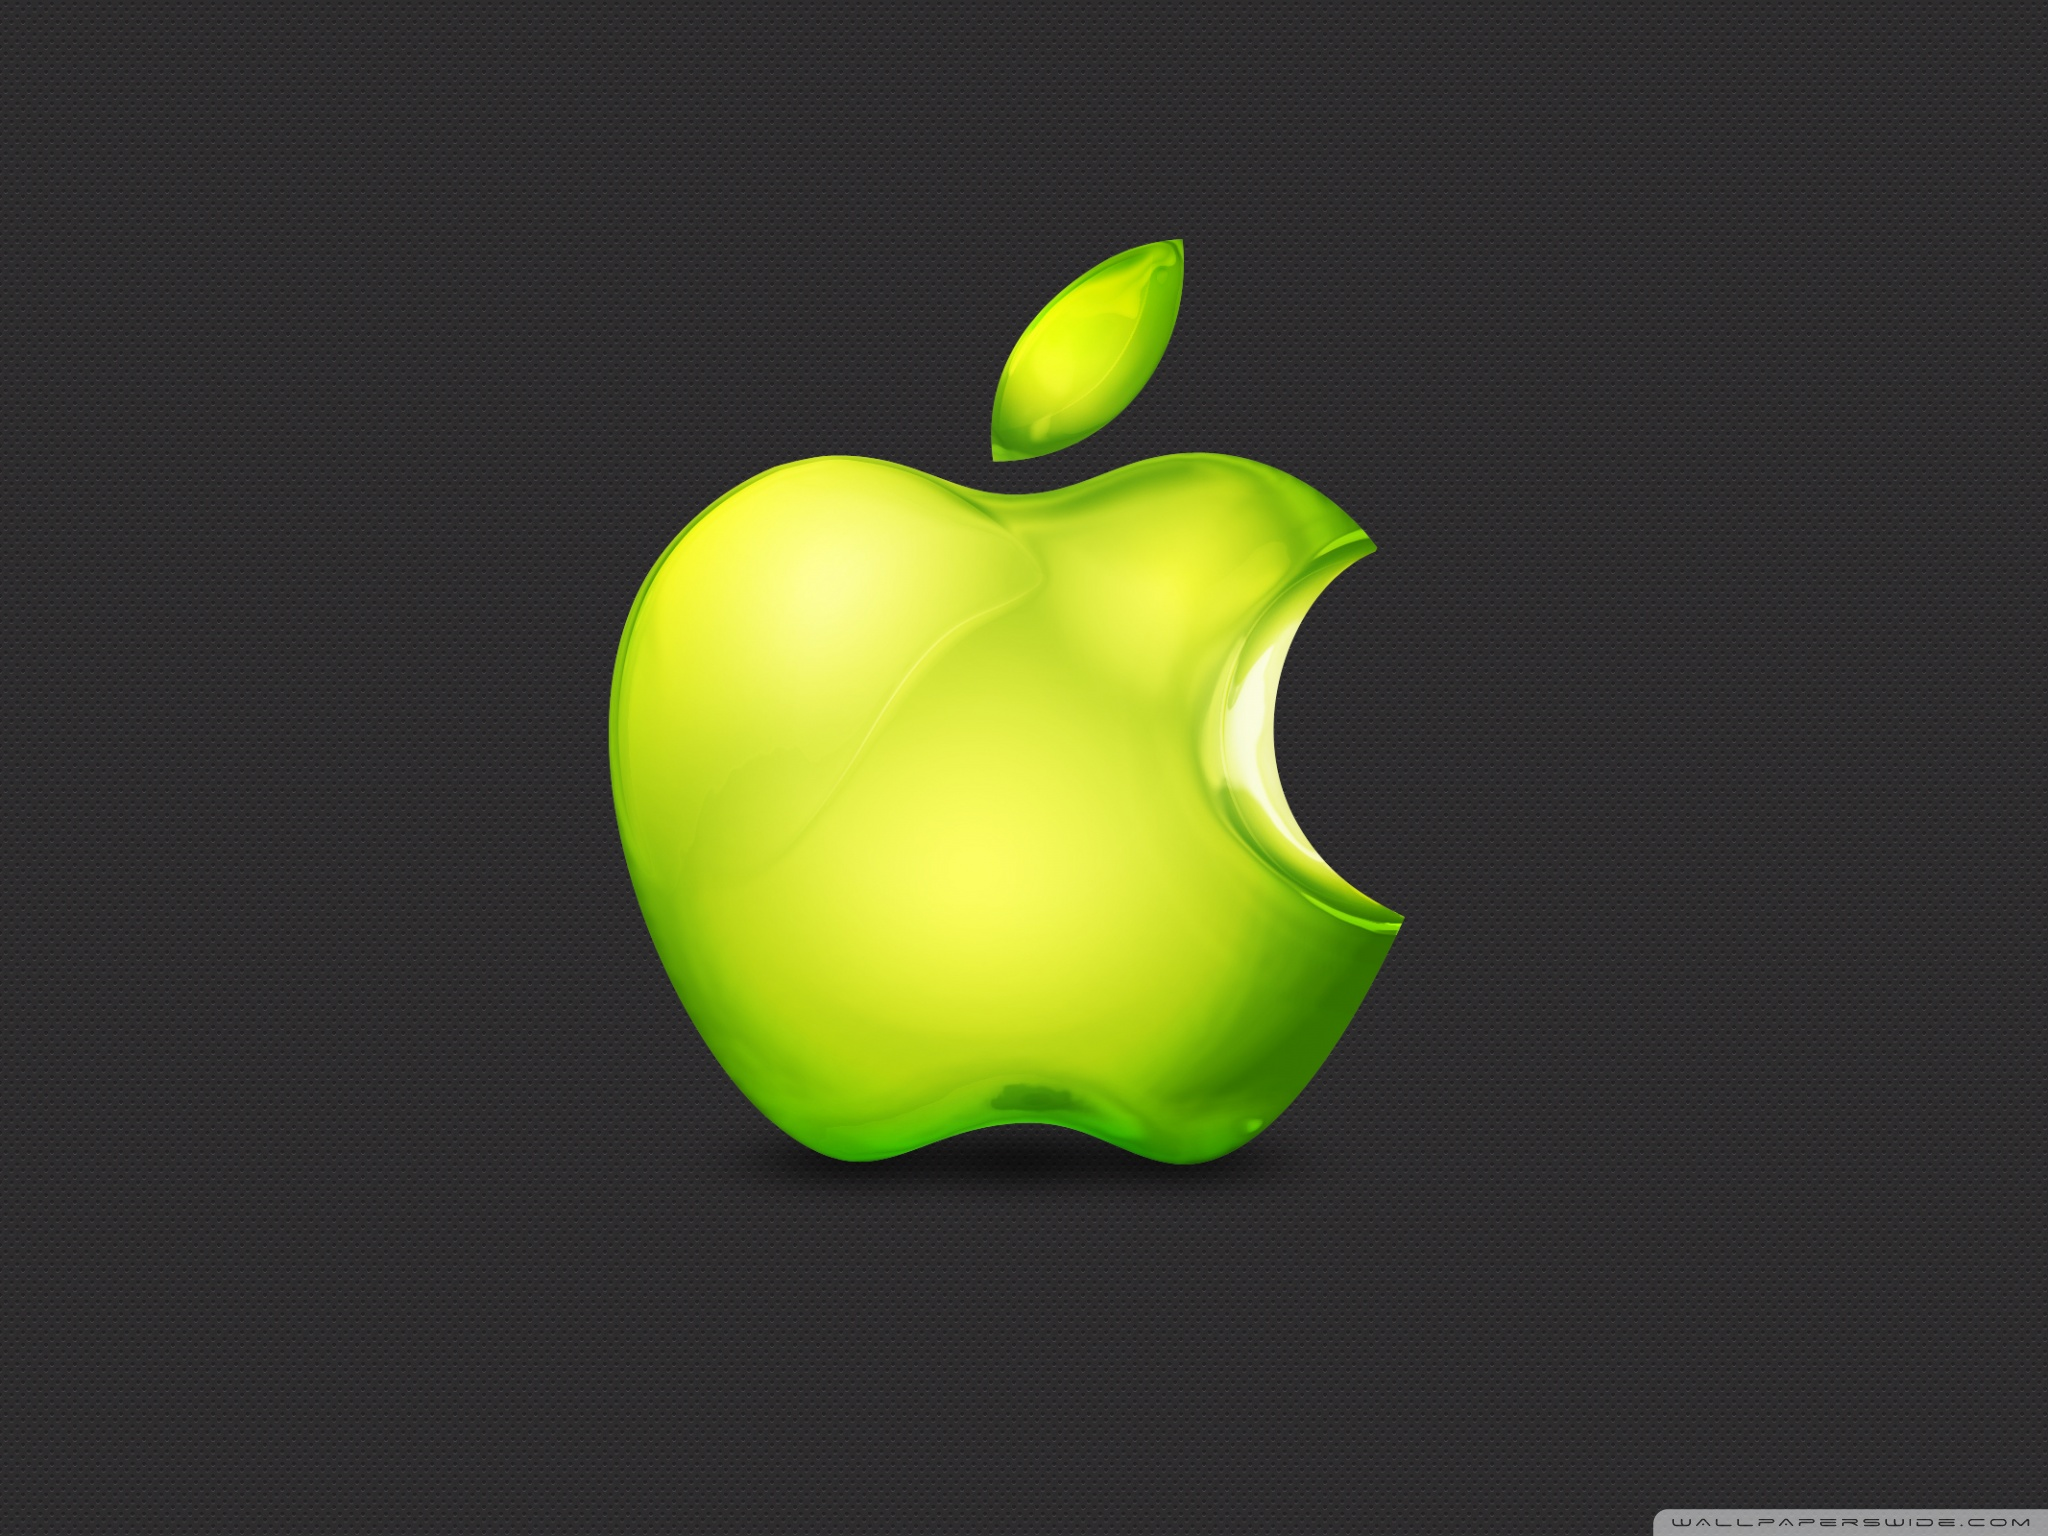 Green Apple Logo Iphone 1979007 Hd Wallpaper